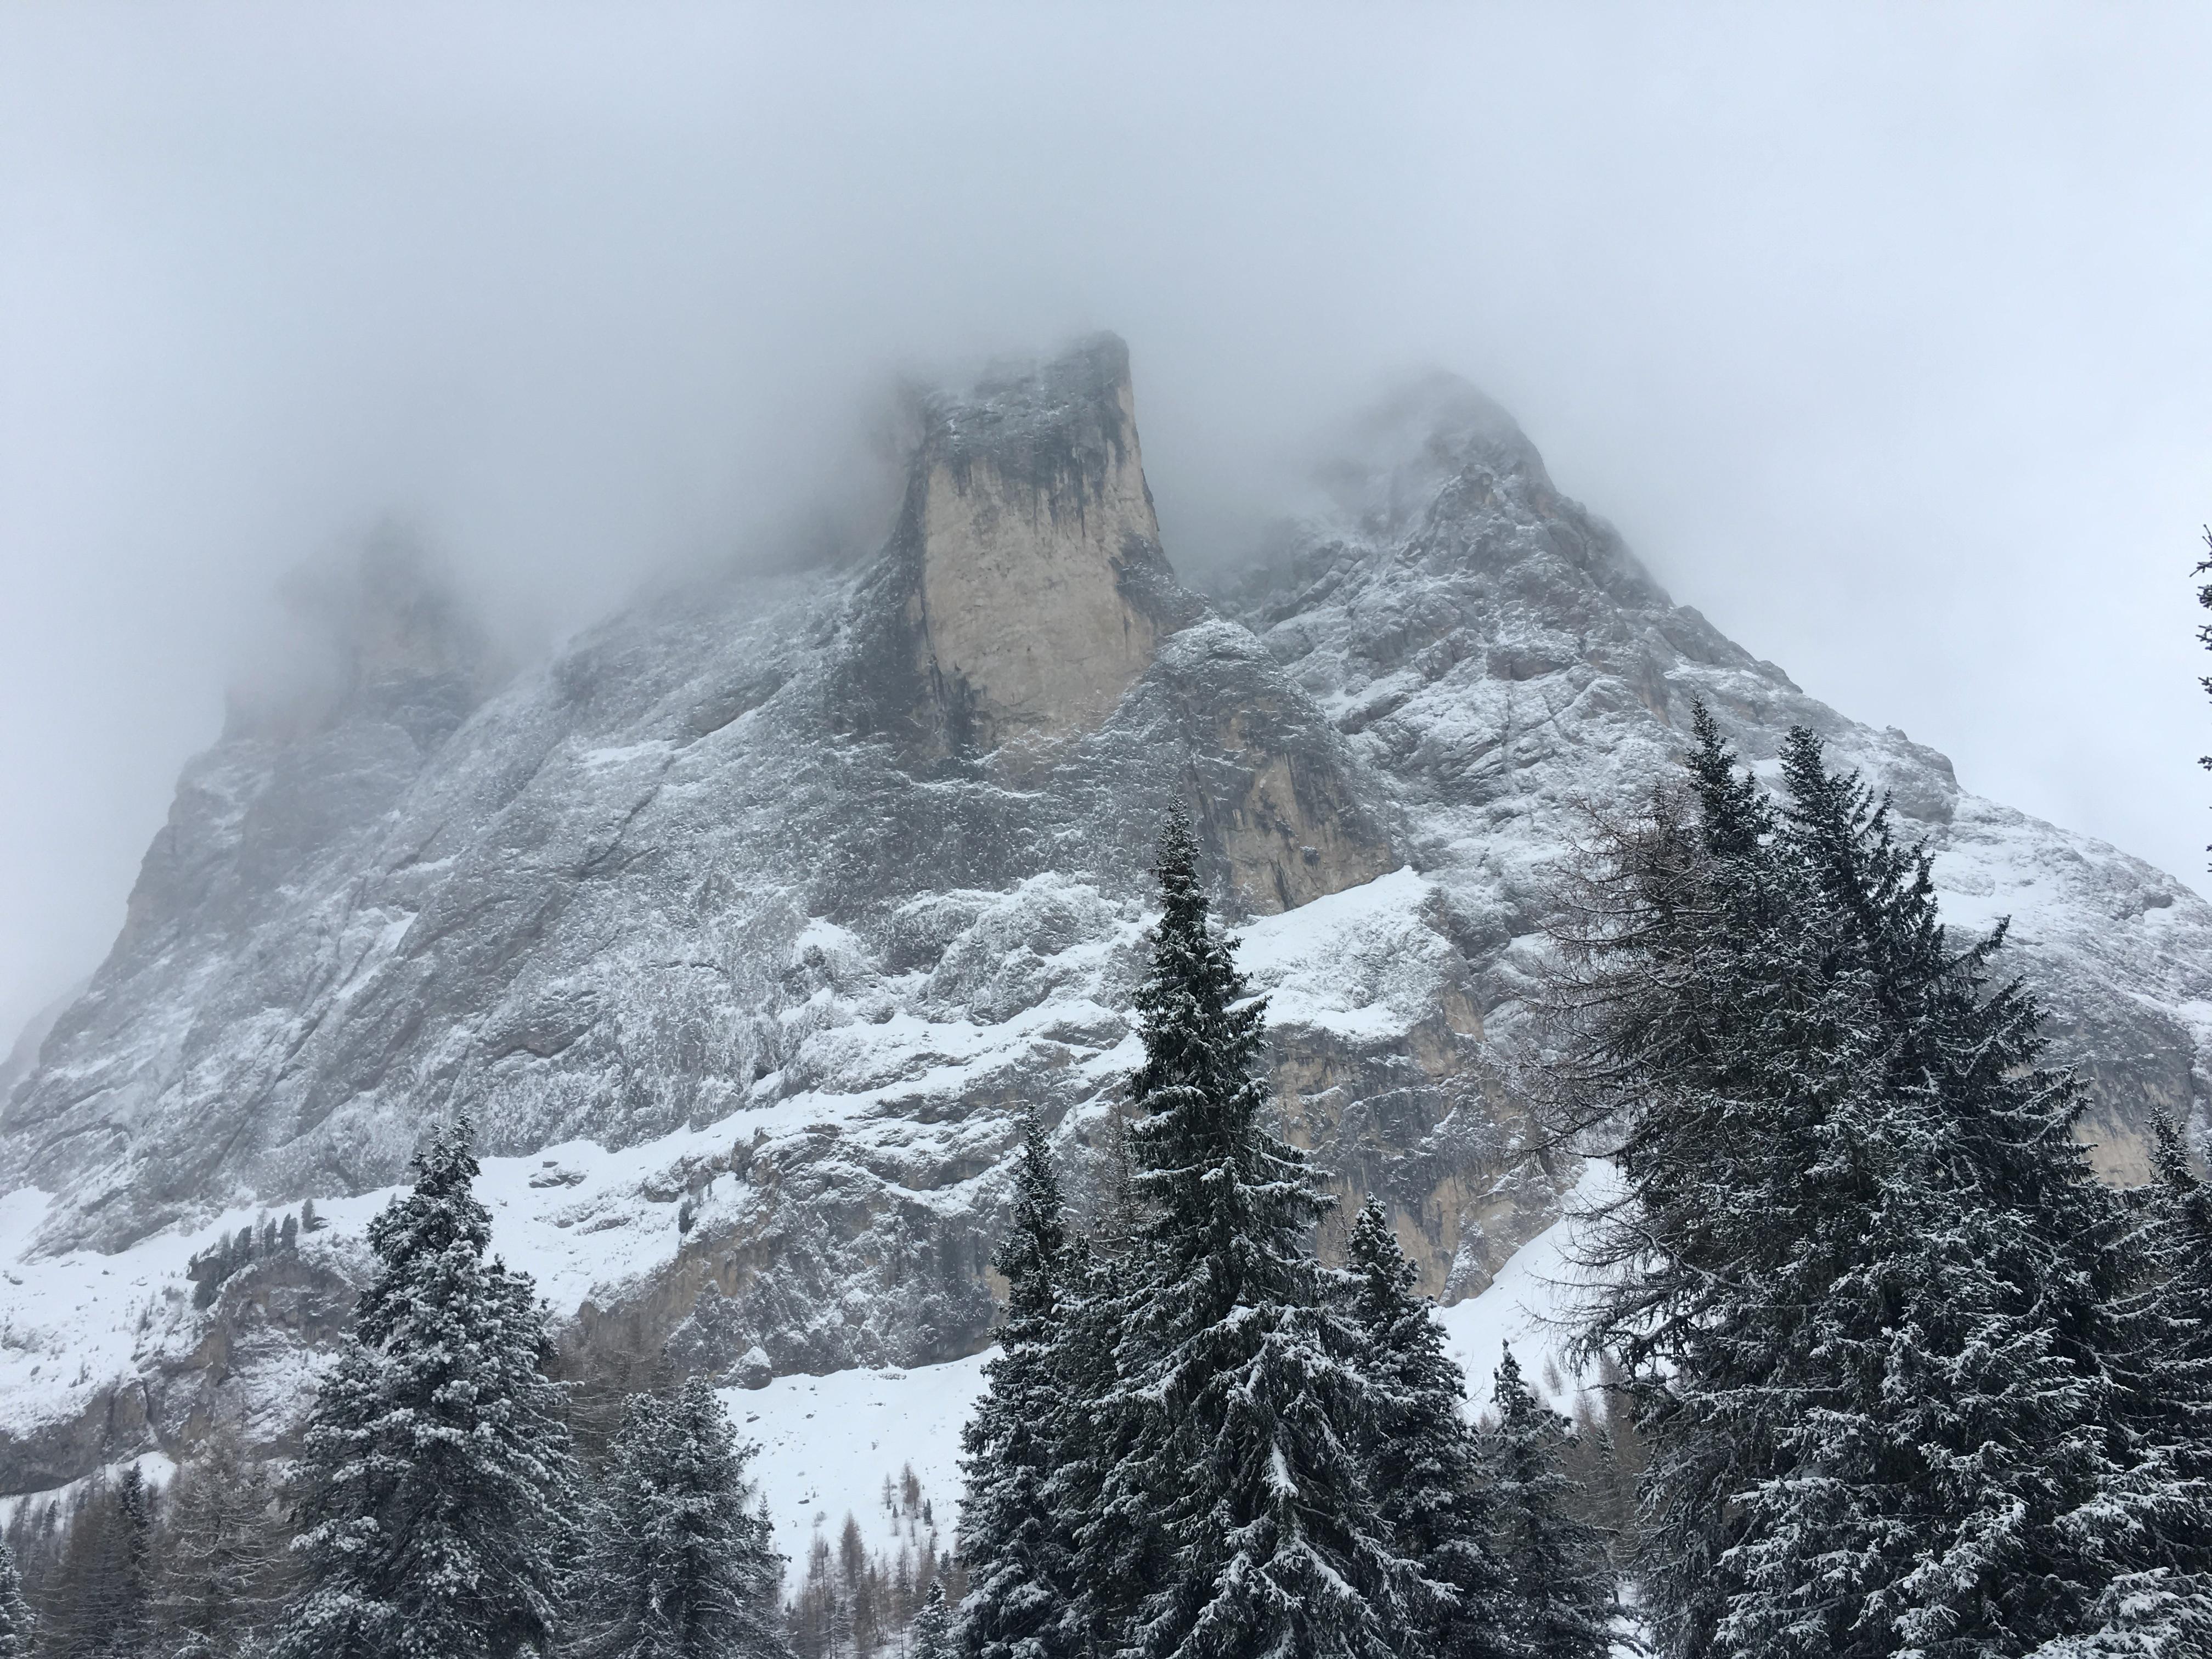 Гора Сассолунго Sassolungo Доломиты горный пейзаж Альберт Сафиуллин